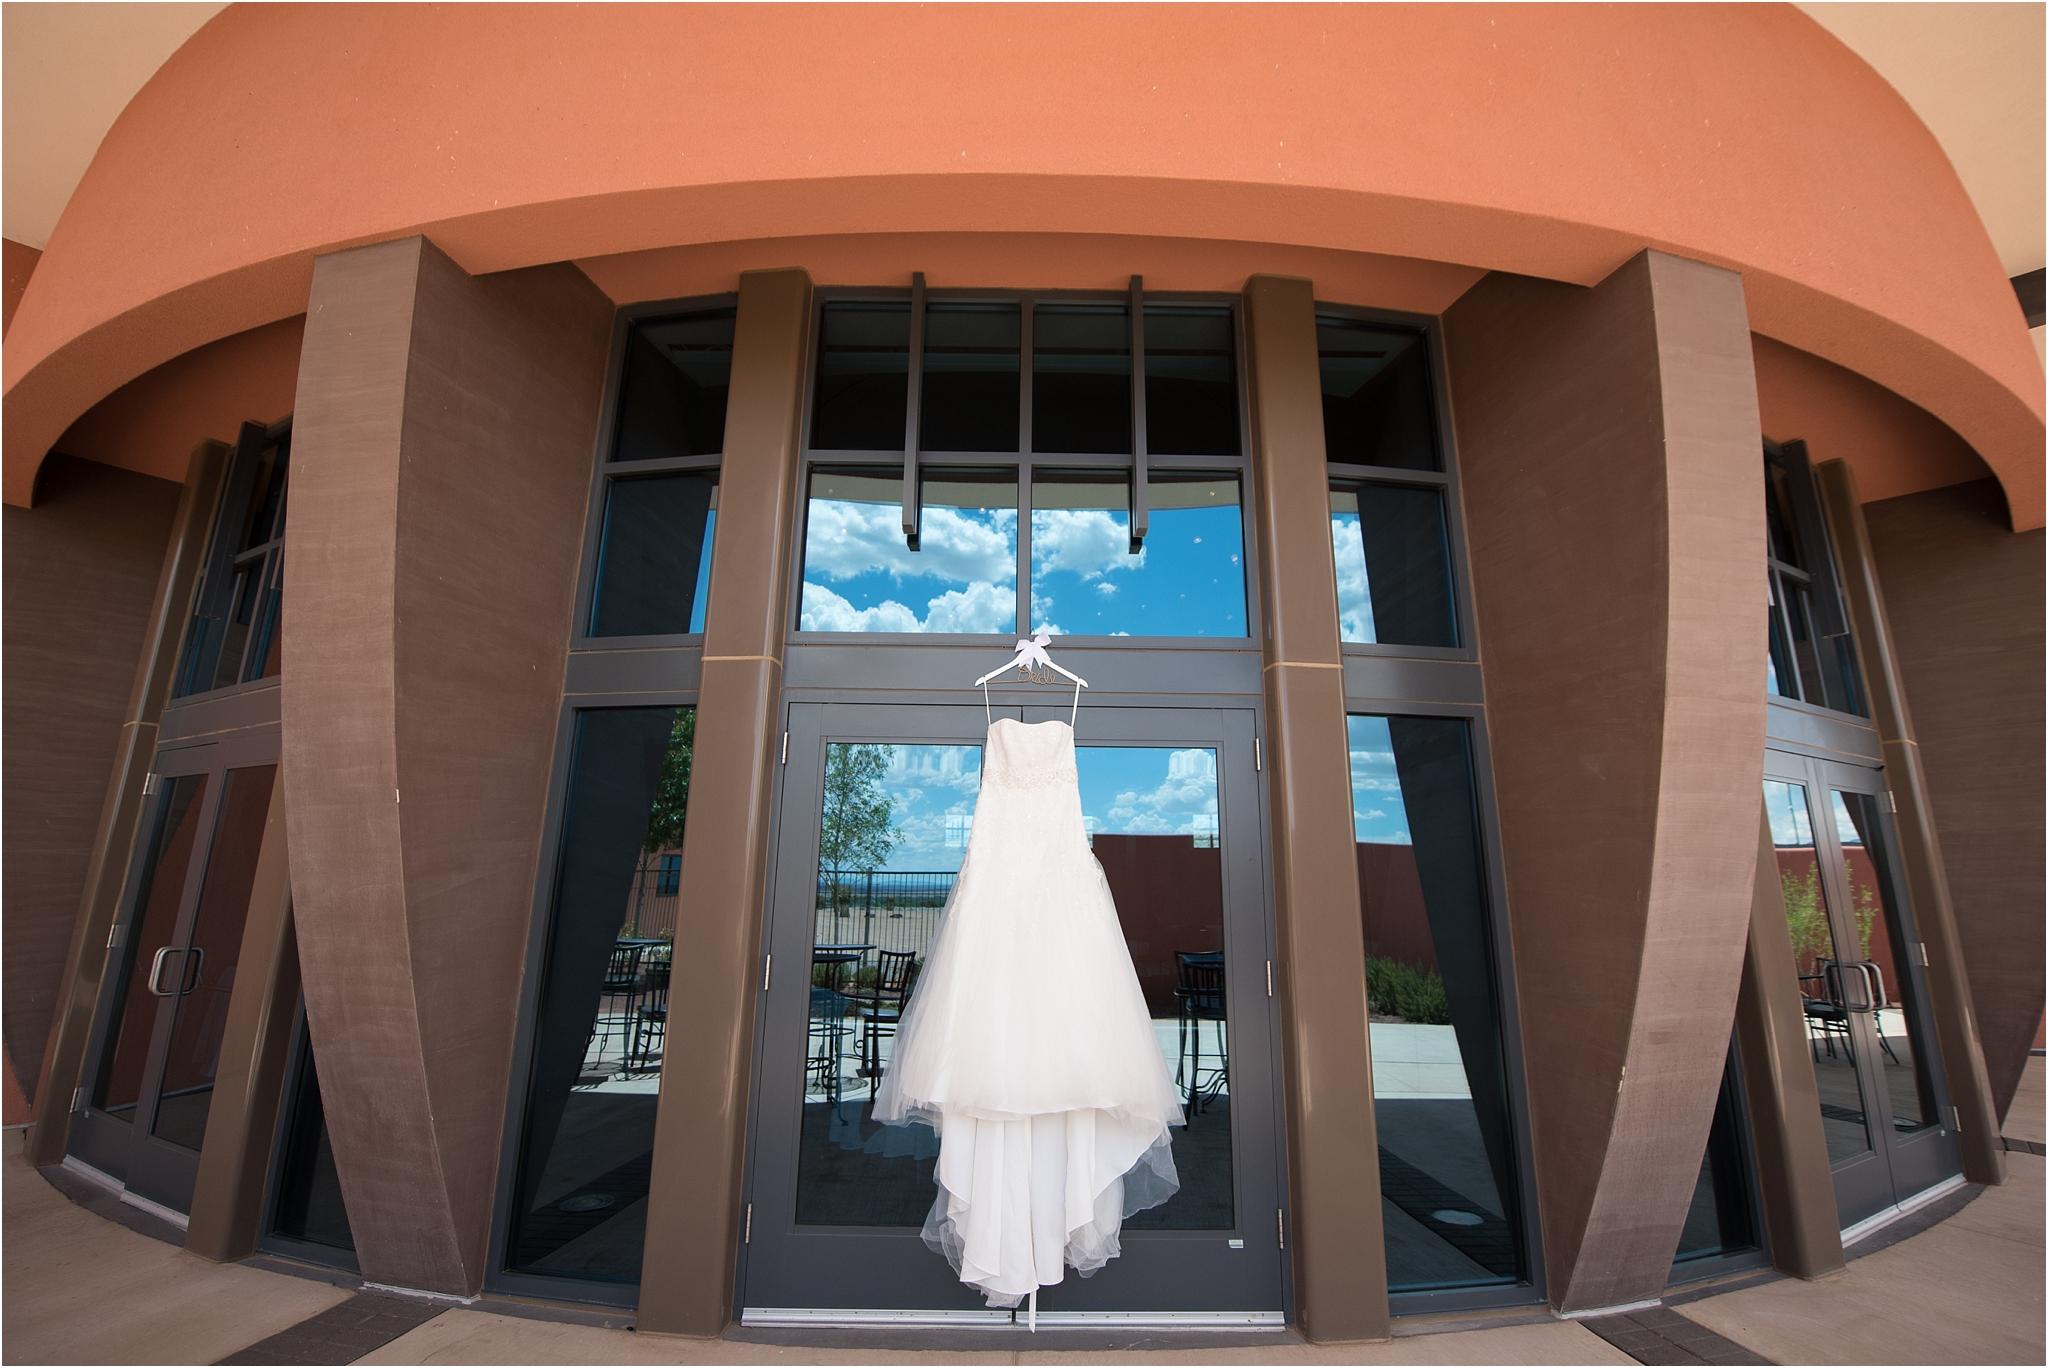 kayla kitts photography - isleta casino wedding - albuquerque wedding photographer - new mexico wedding photographer - de novo pastoral_0001.jpg